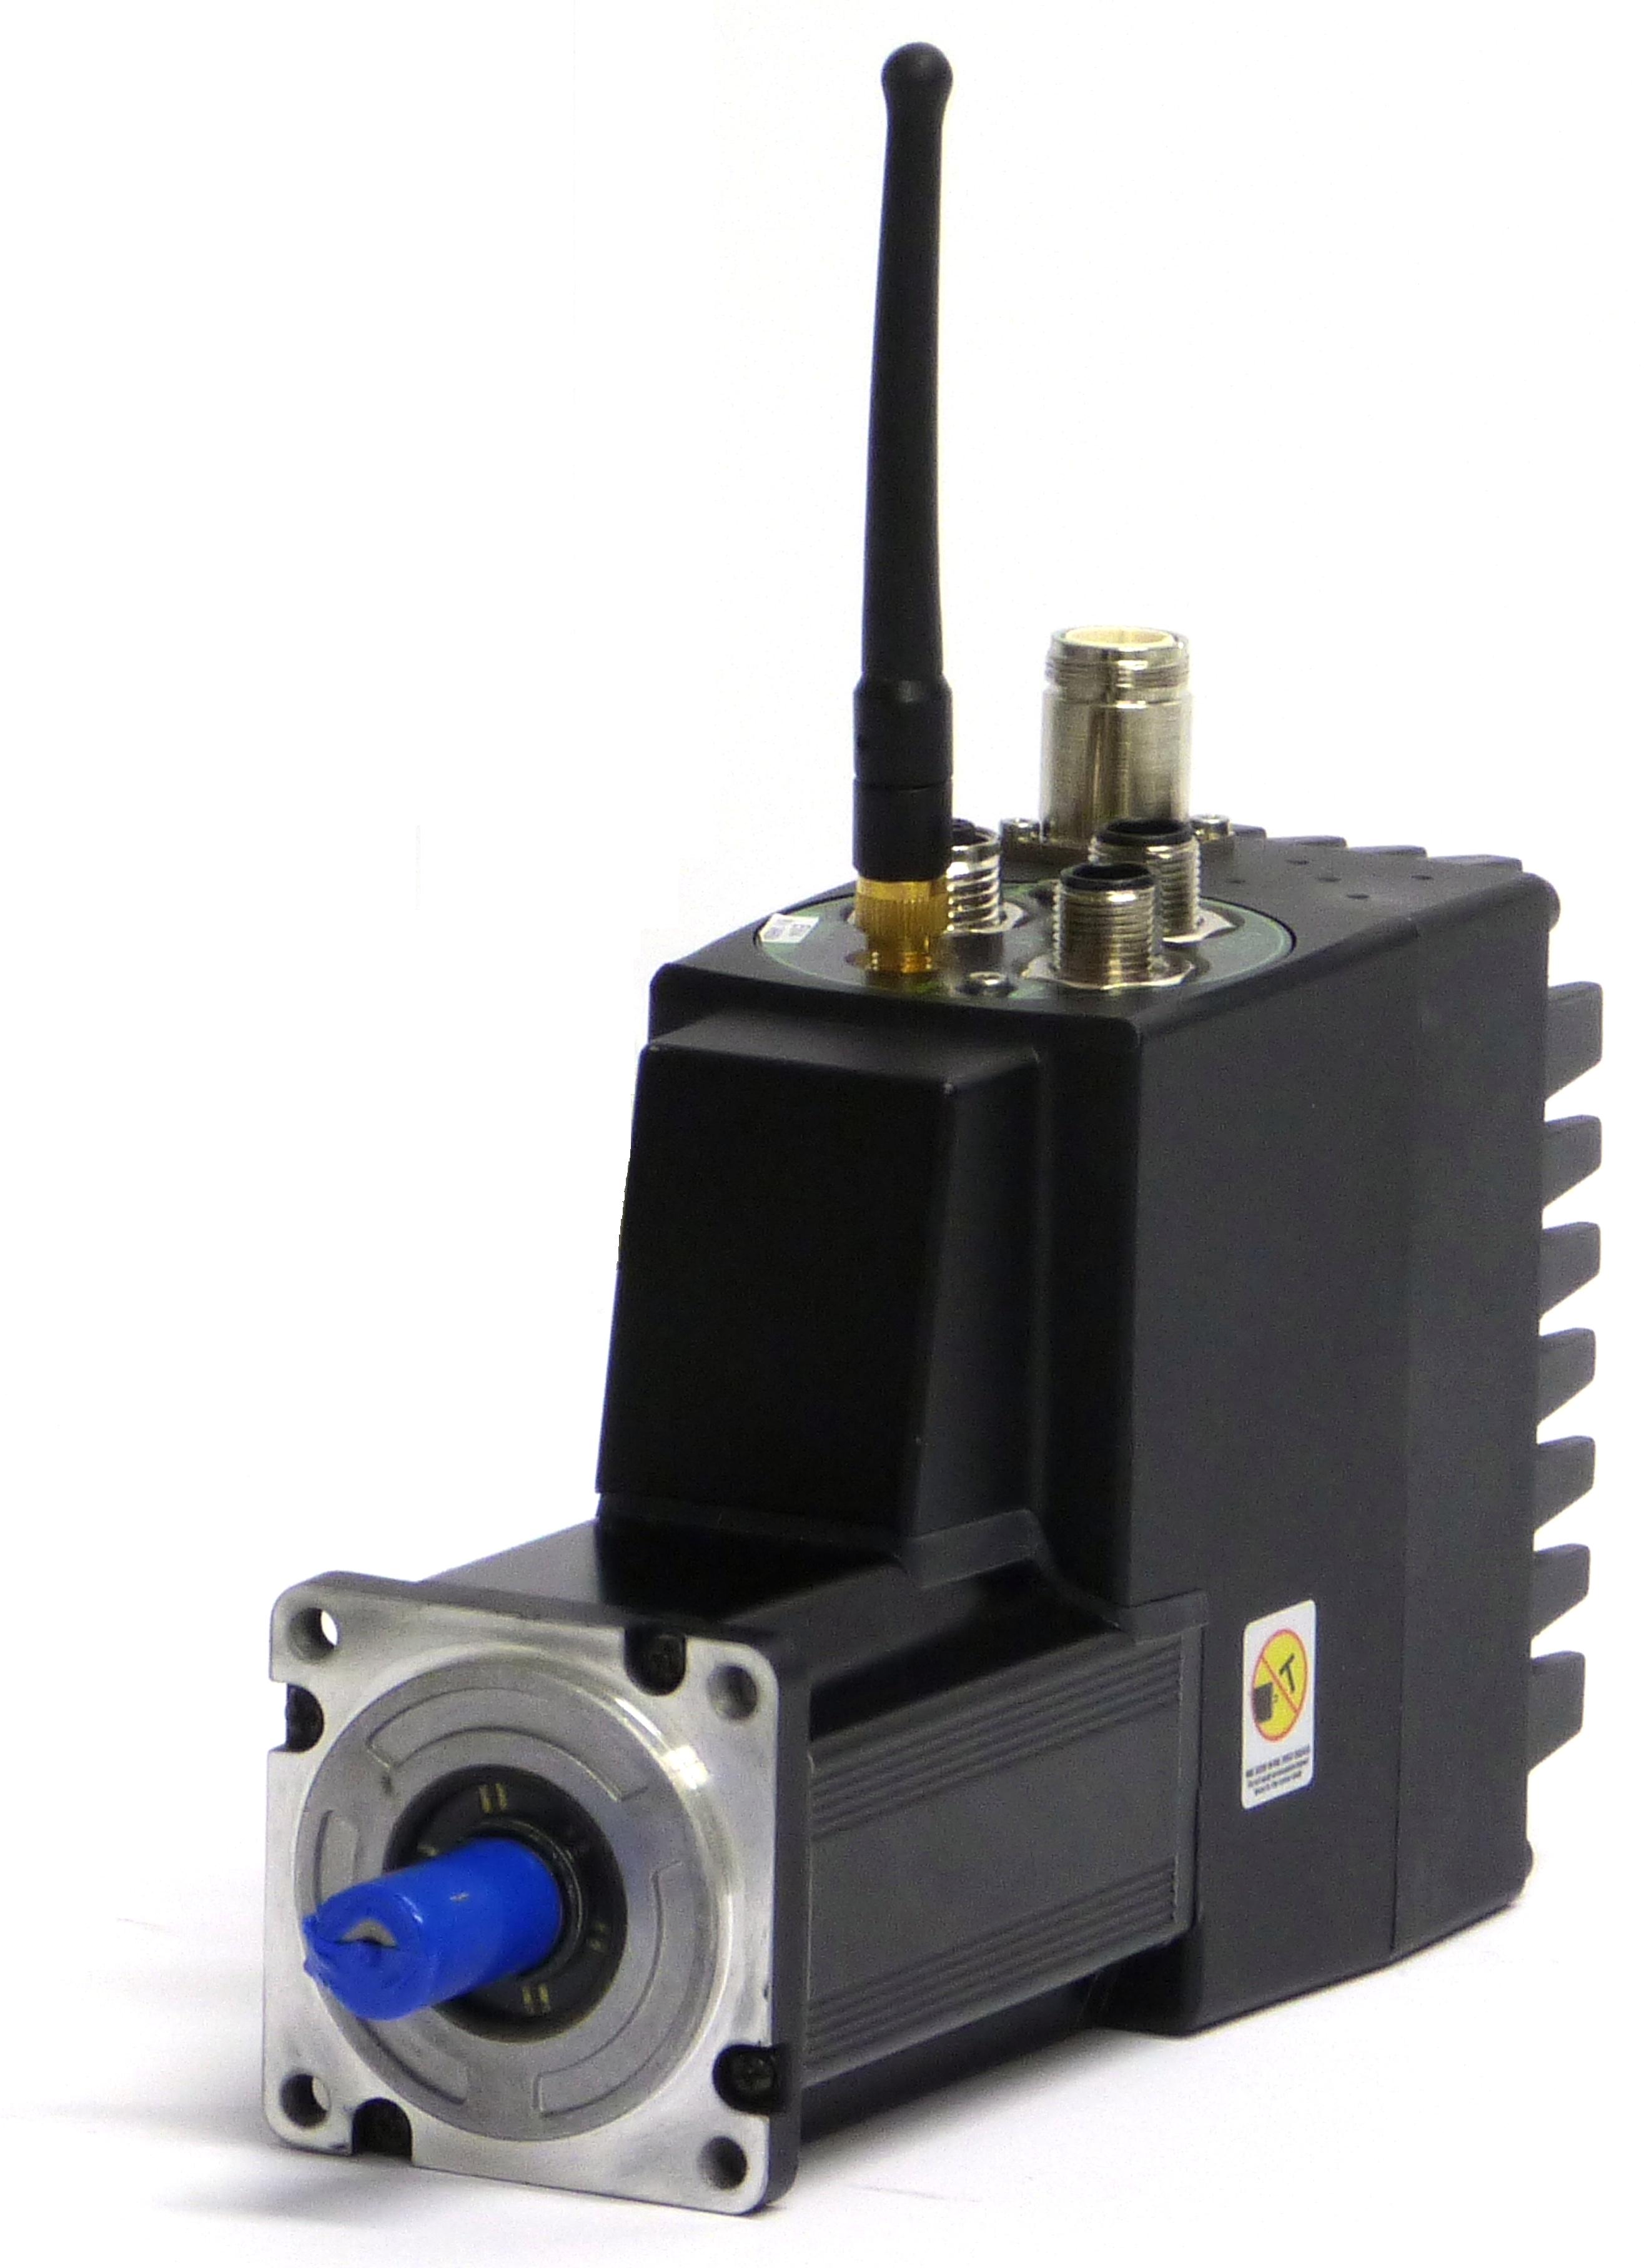 MAC402 Antenna